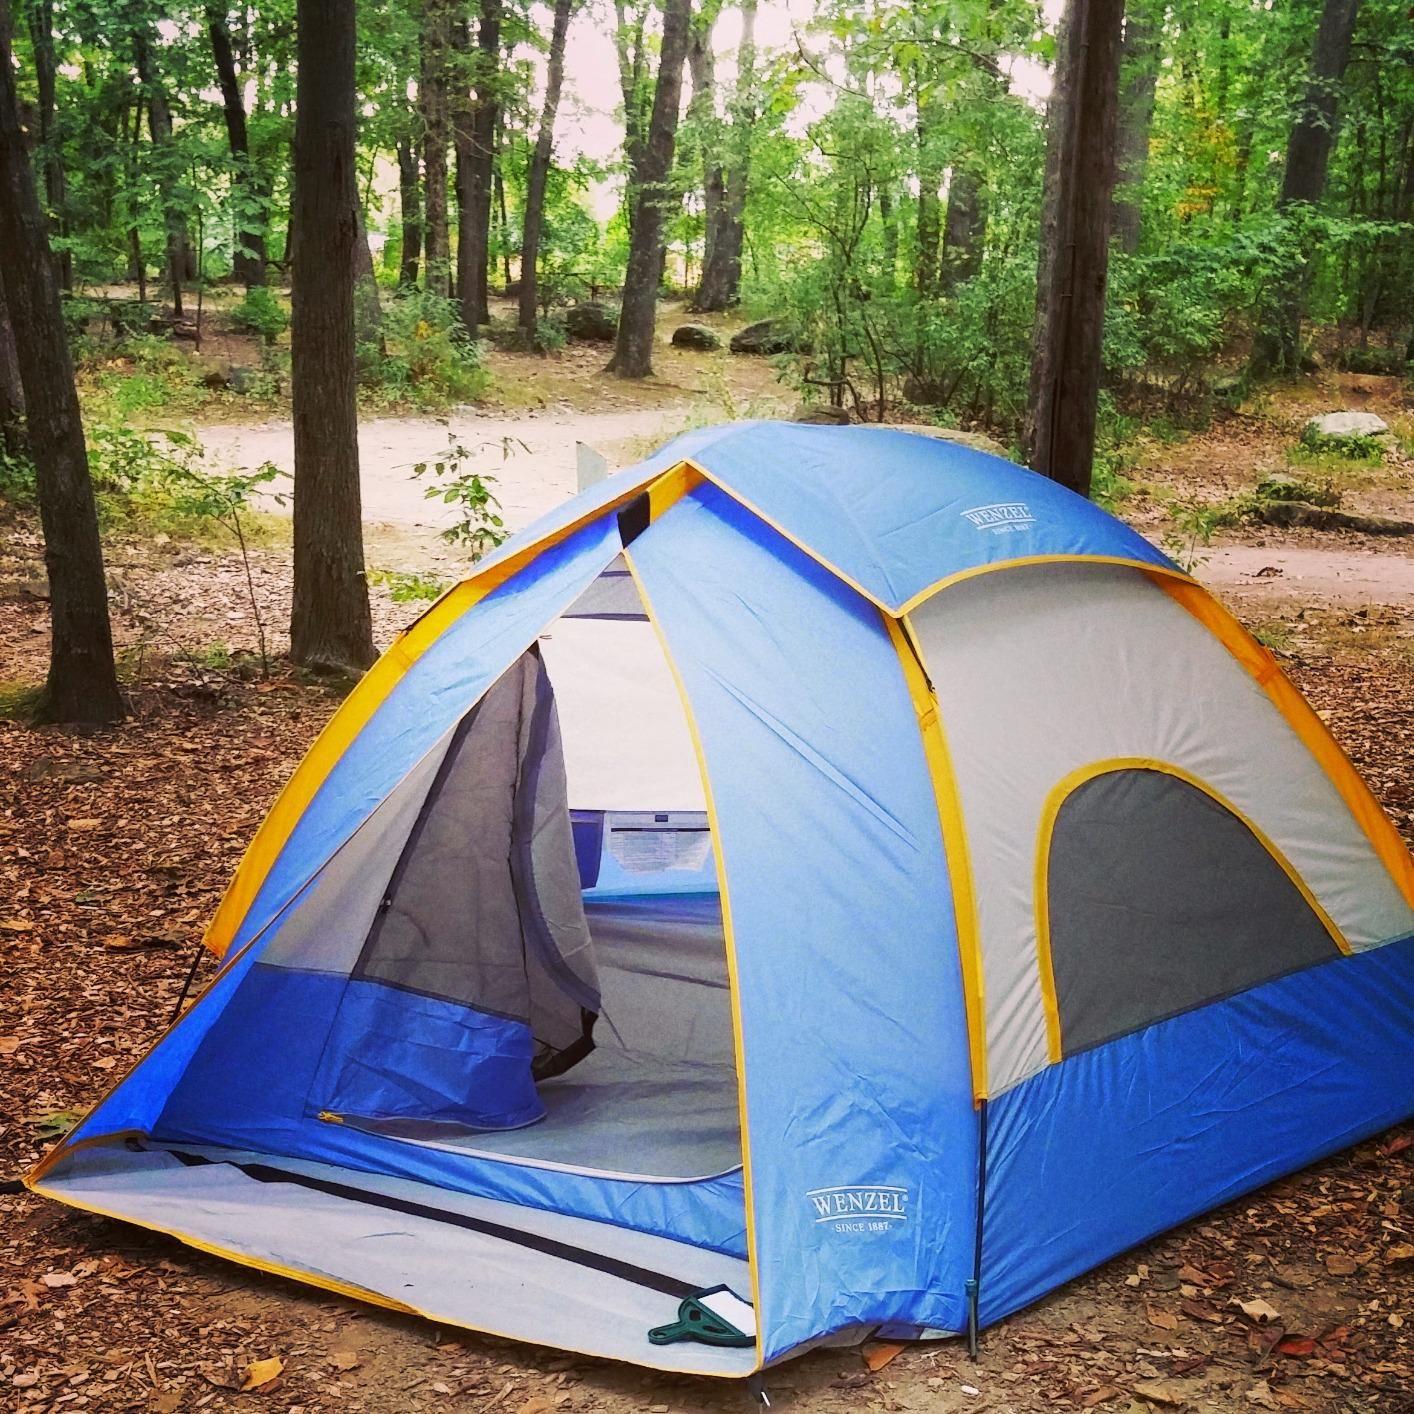 Wenzel Alpine 3 Person Tent 3 Person 3 Pole Pentadome Tent Wenzel Alpine Person Tent Tent 3 Person Tent 8 Person Tent